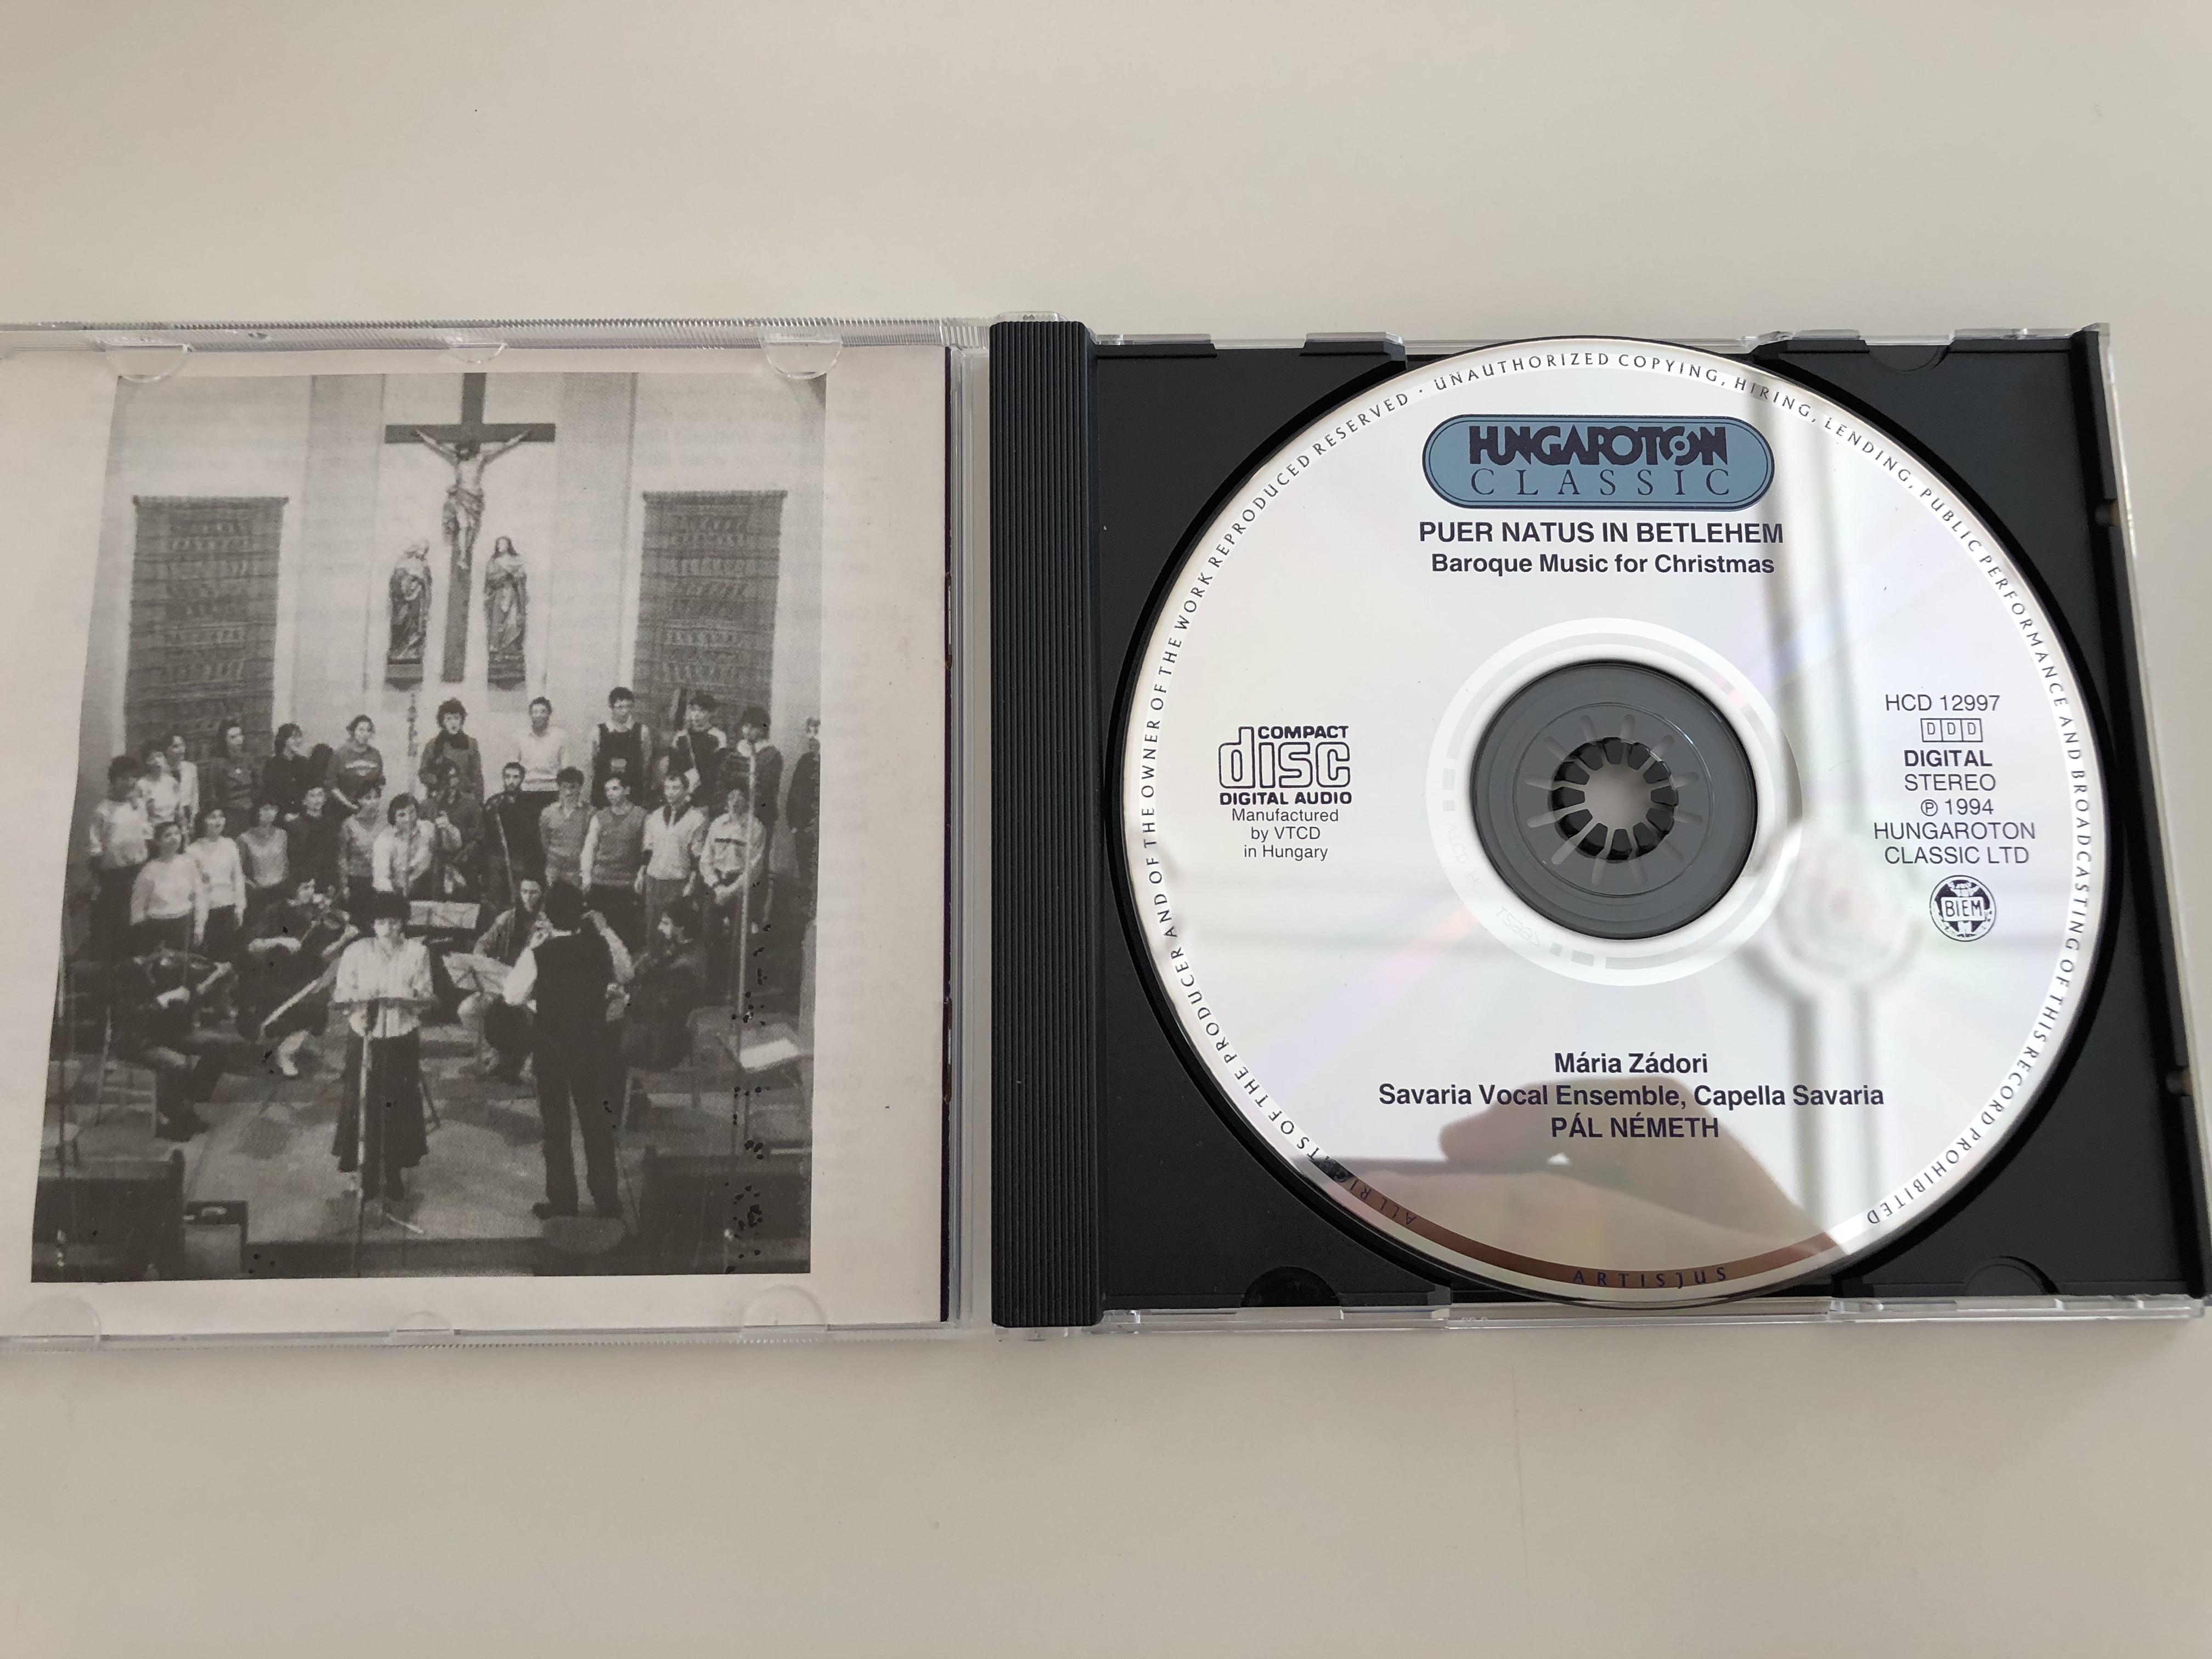 puer-natus-in-betlehem-baroque-music-for-christmas-m-ria-z-dori-capella-savaria-savaria-vocal-ensemble-conducted-by-p-l-n-meth-hungaroton-classic-audio-cd-1994-hcd-12997-7-.jpg